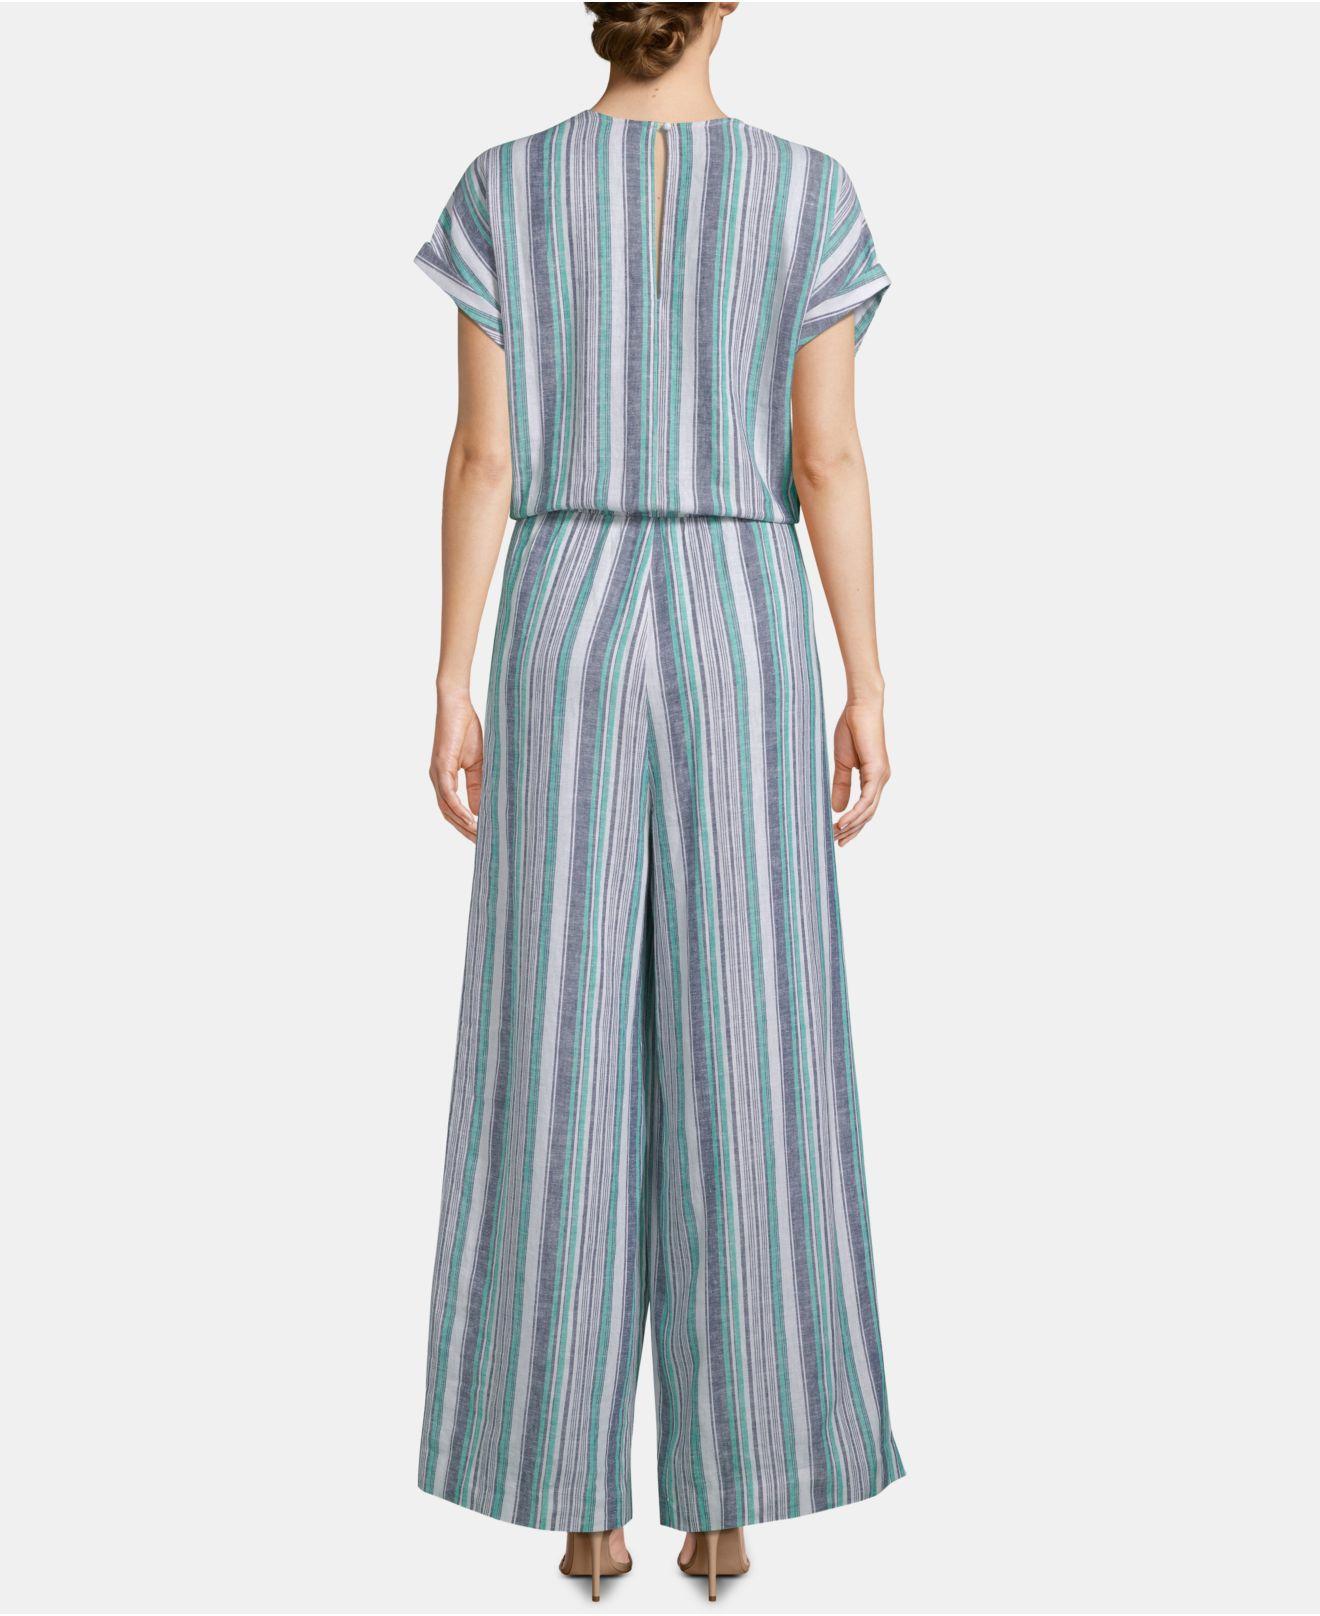 d84d0ff8a8df Lyst - Eci Striped Surplice Kimono Jumpsuit in Blue